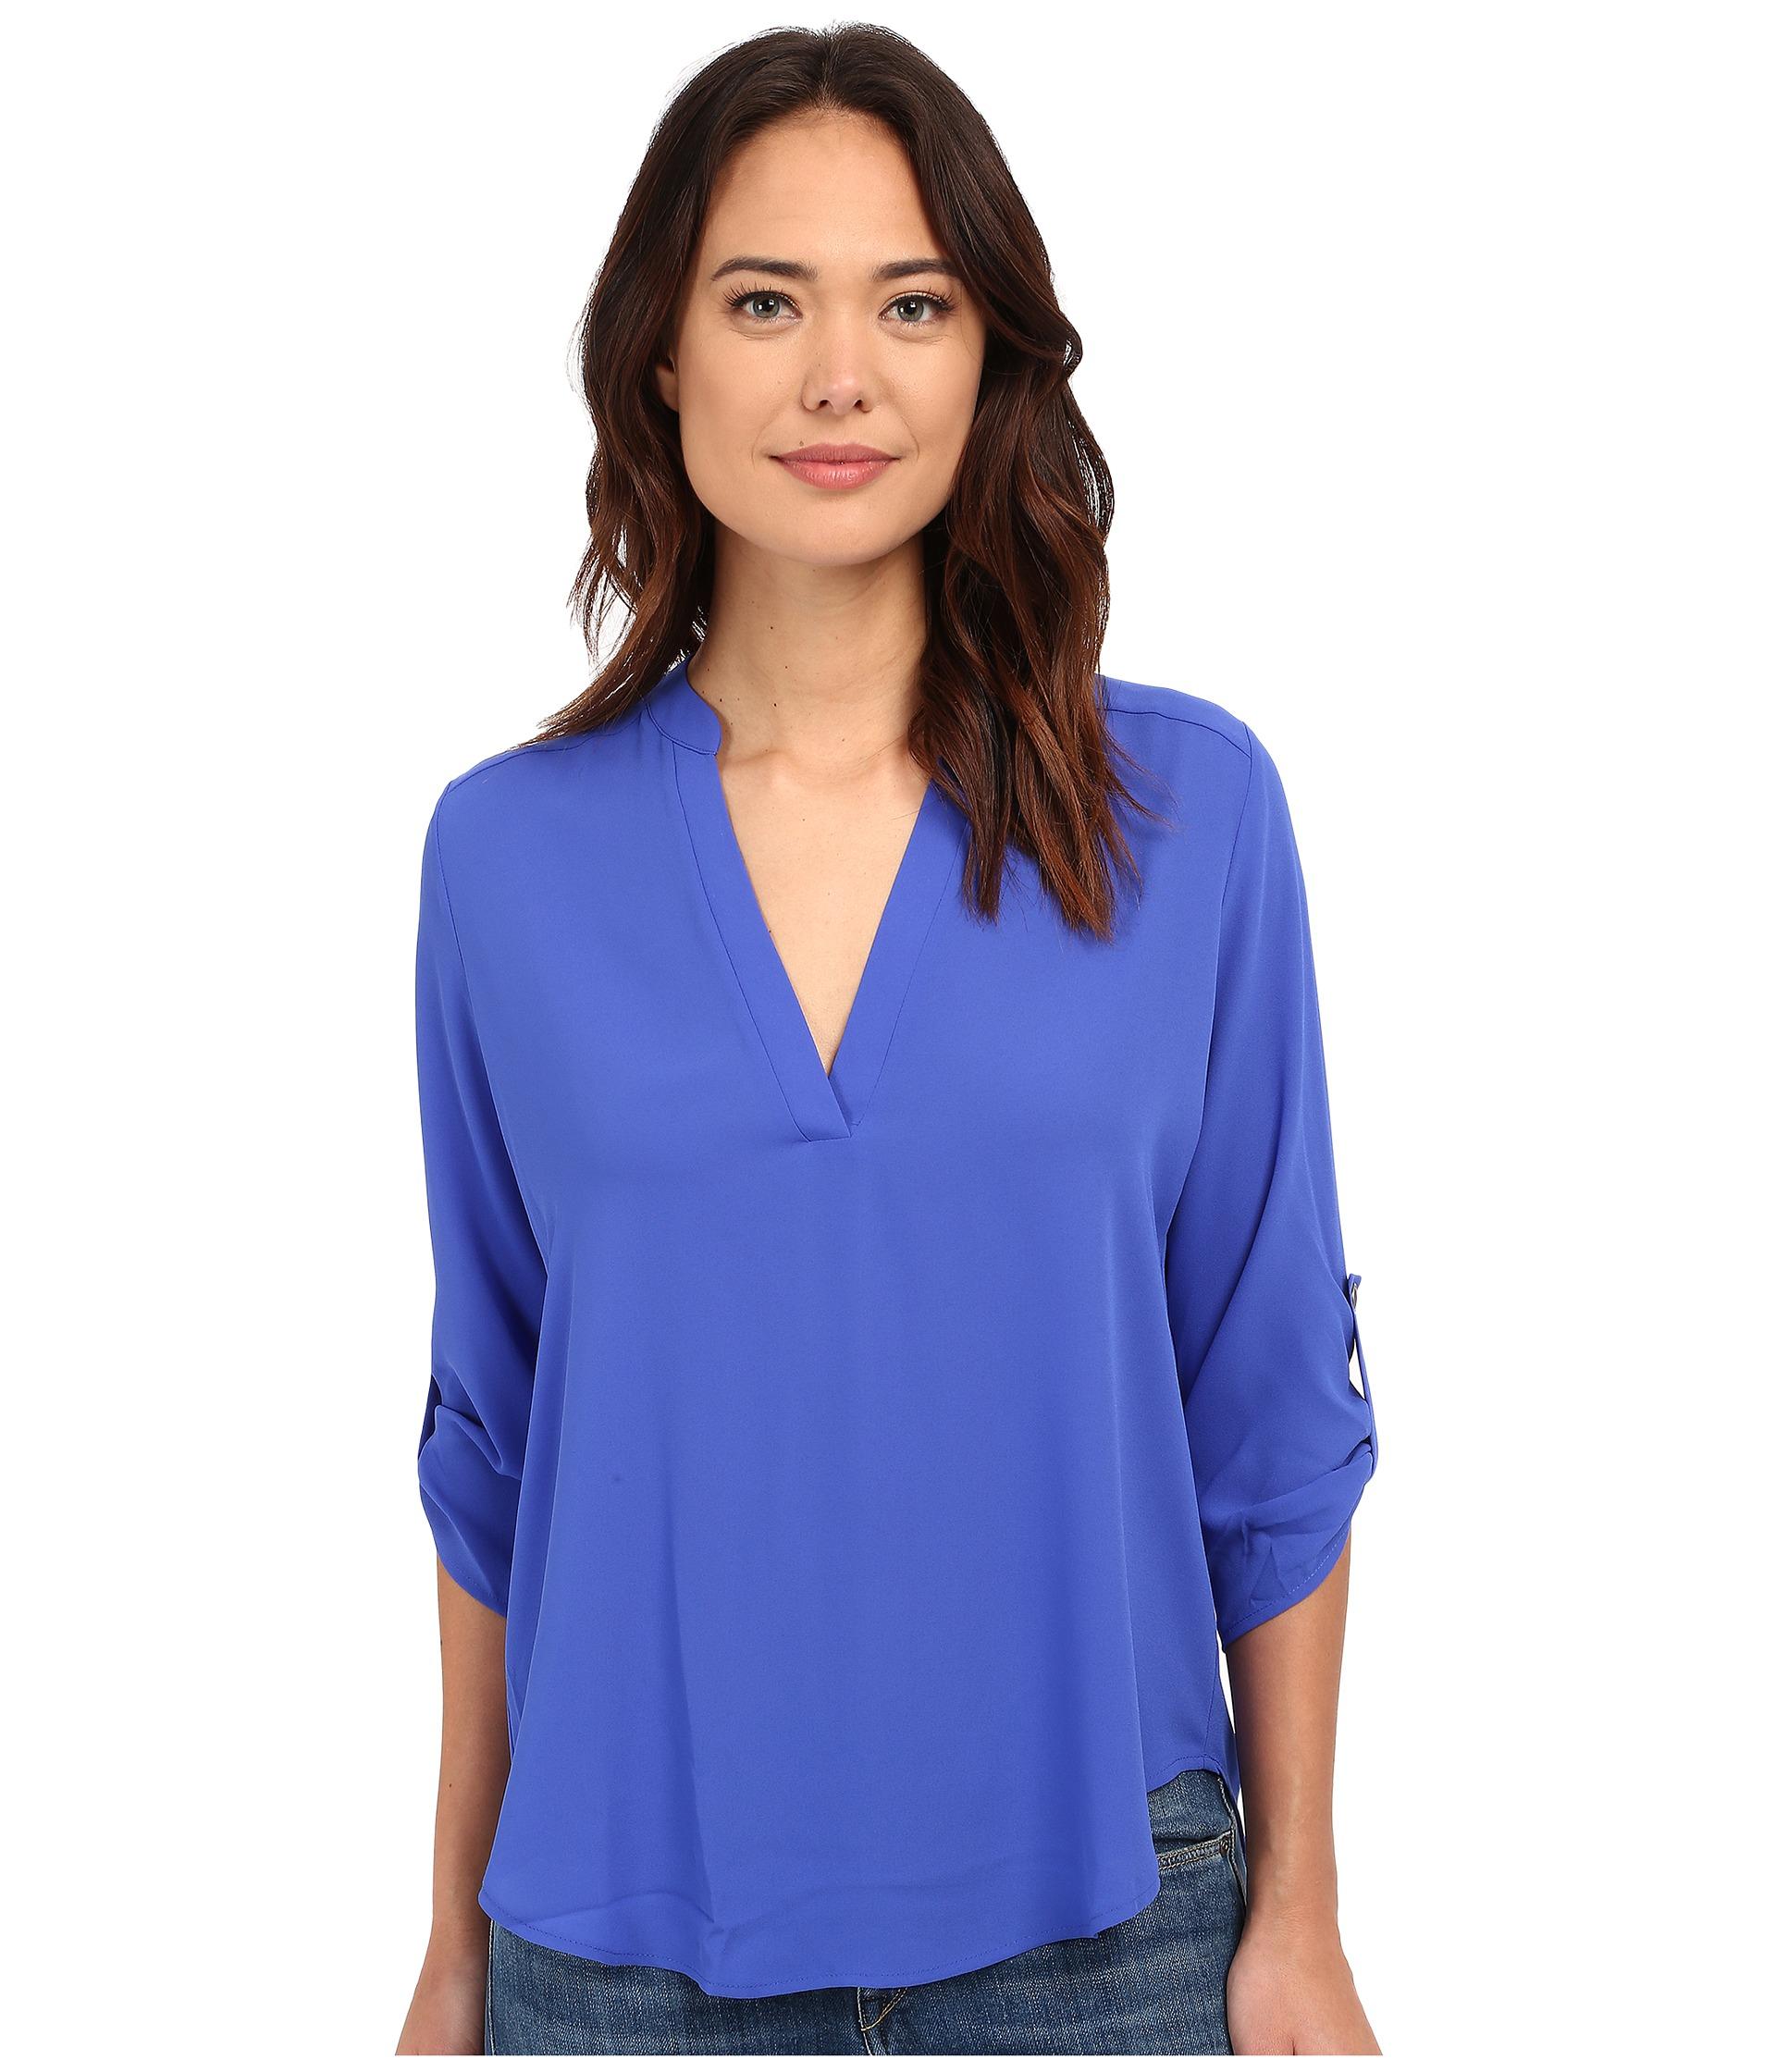 Brigitte bailey Channing V-neck Blouse in Blue | Lyst